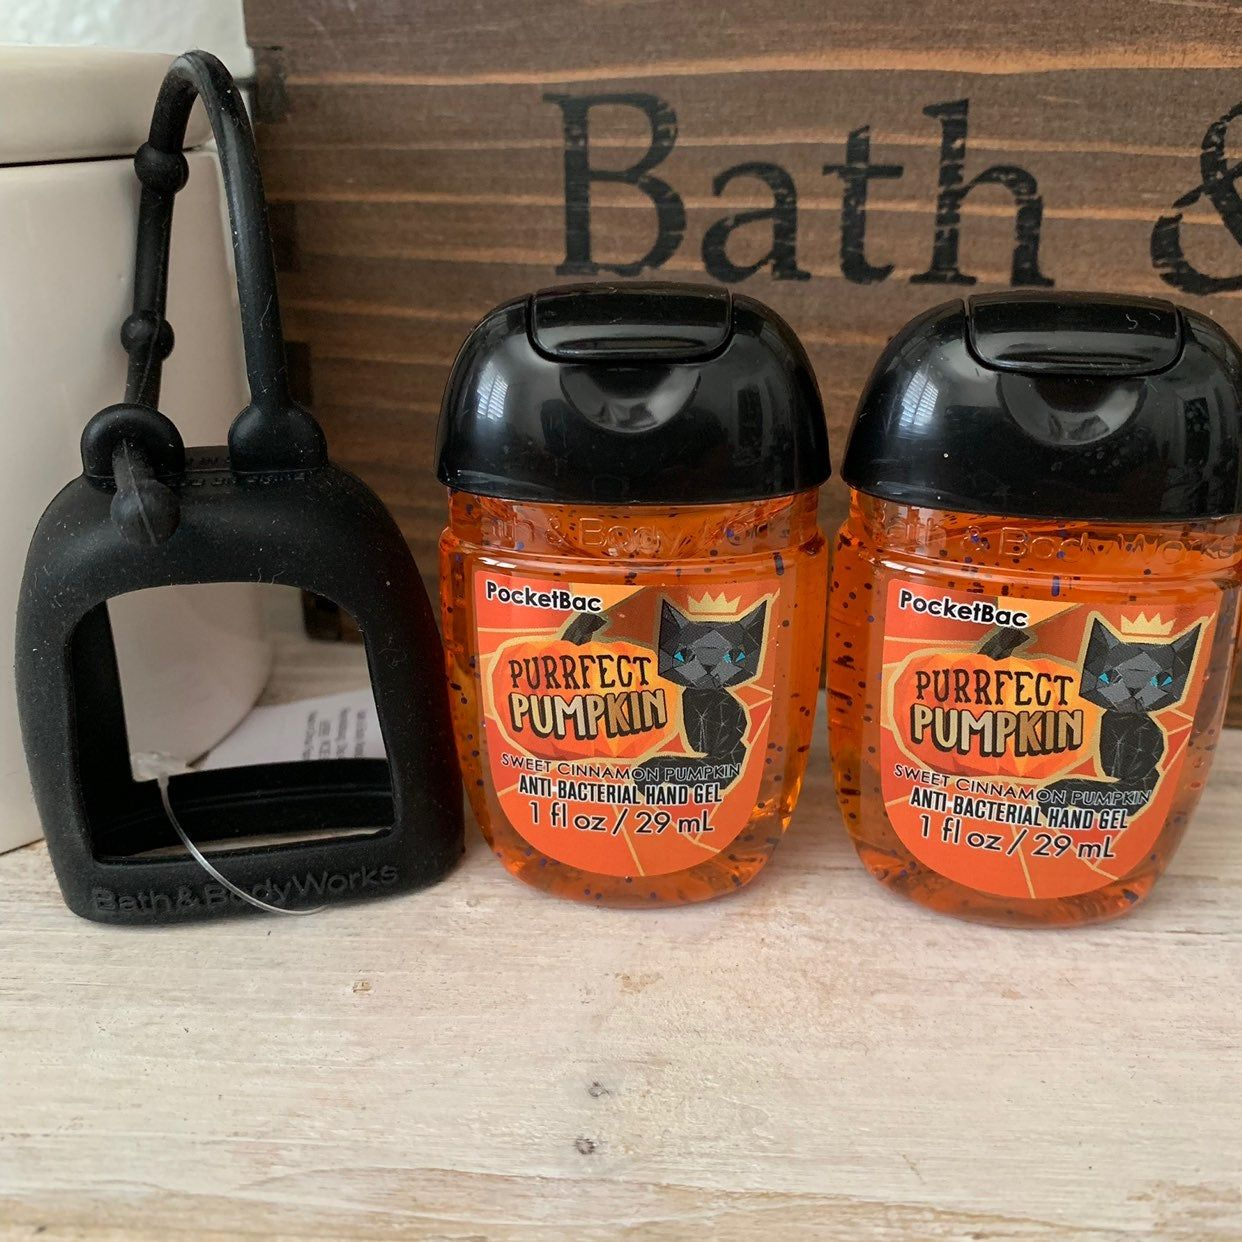 Details About 1 Bath Body Works Halloween Pocketbac Anti